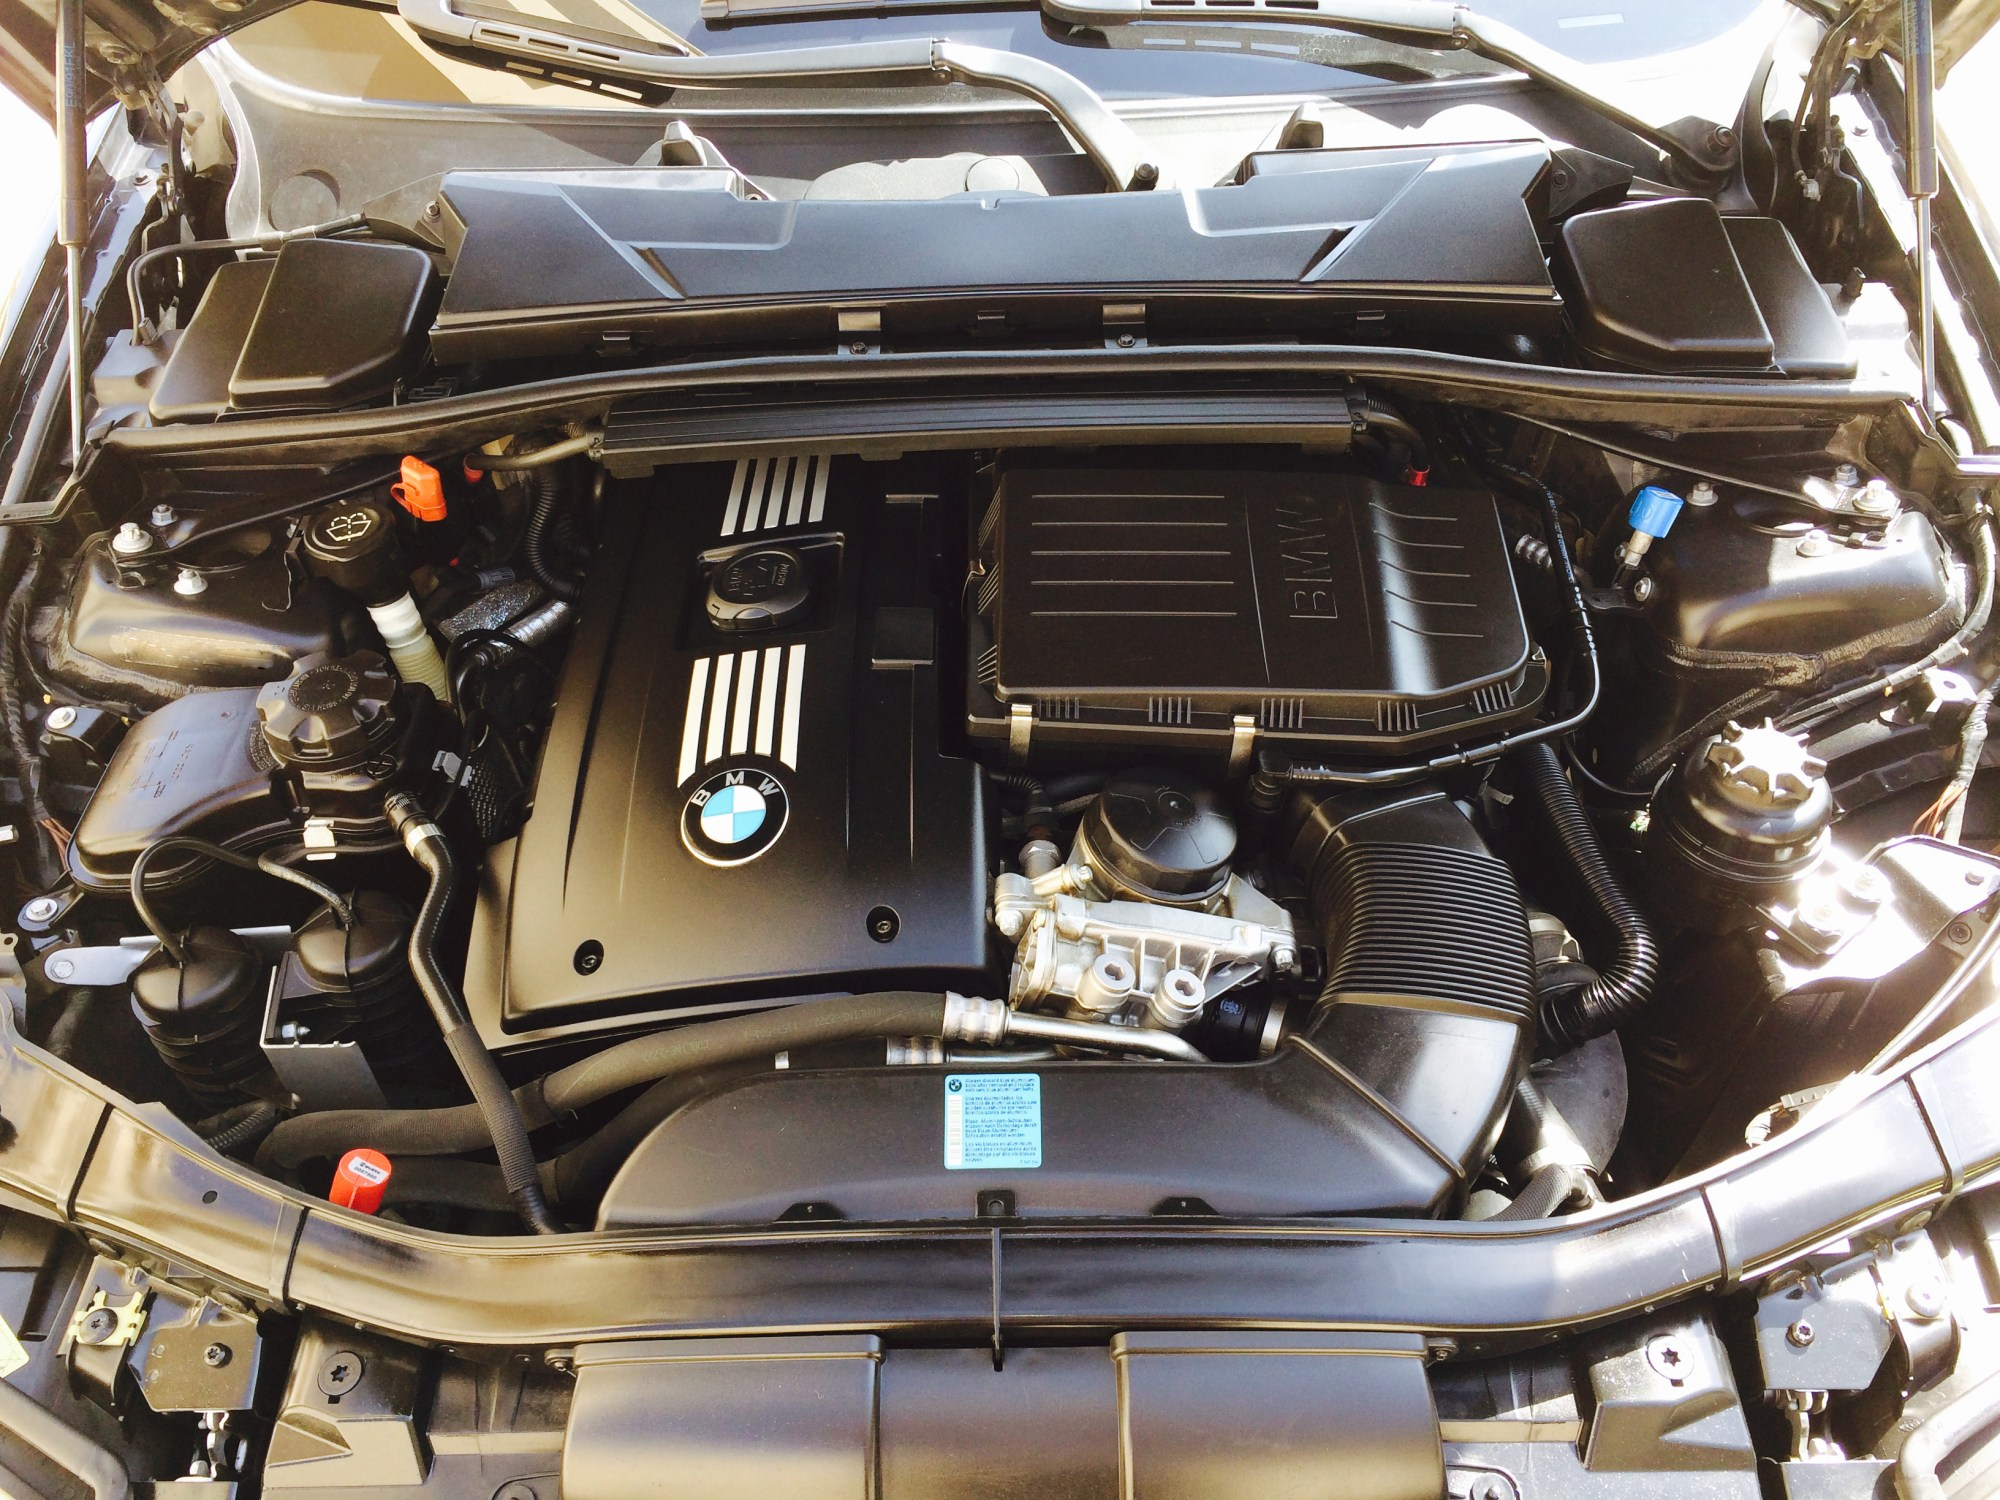 hight resolution of n54 engine bay diagram parts auto parts catalog and diagram e90 335i engine diagram bmw 335i